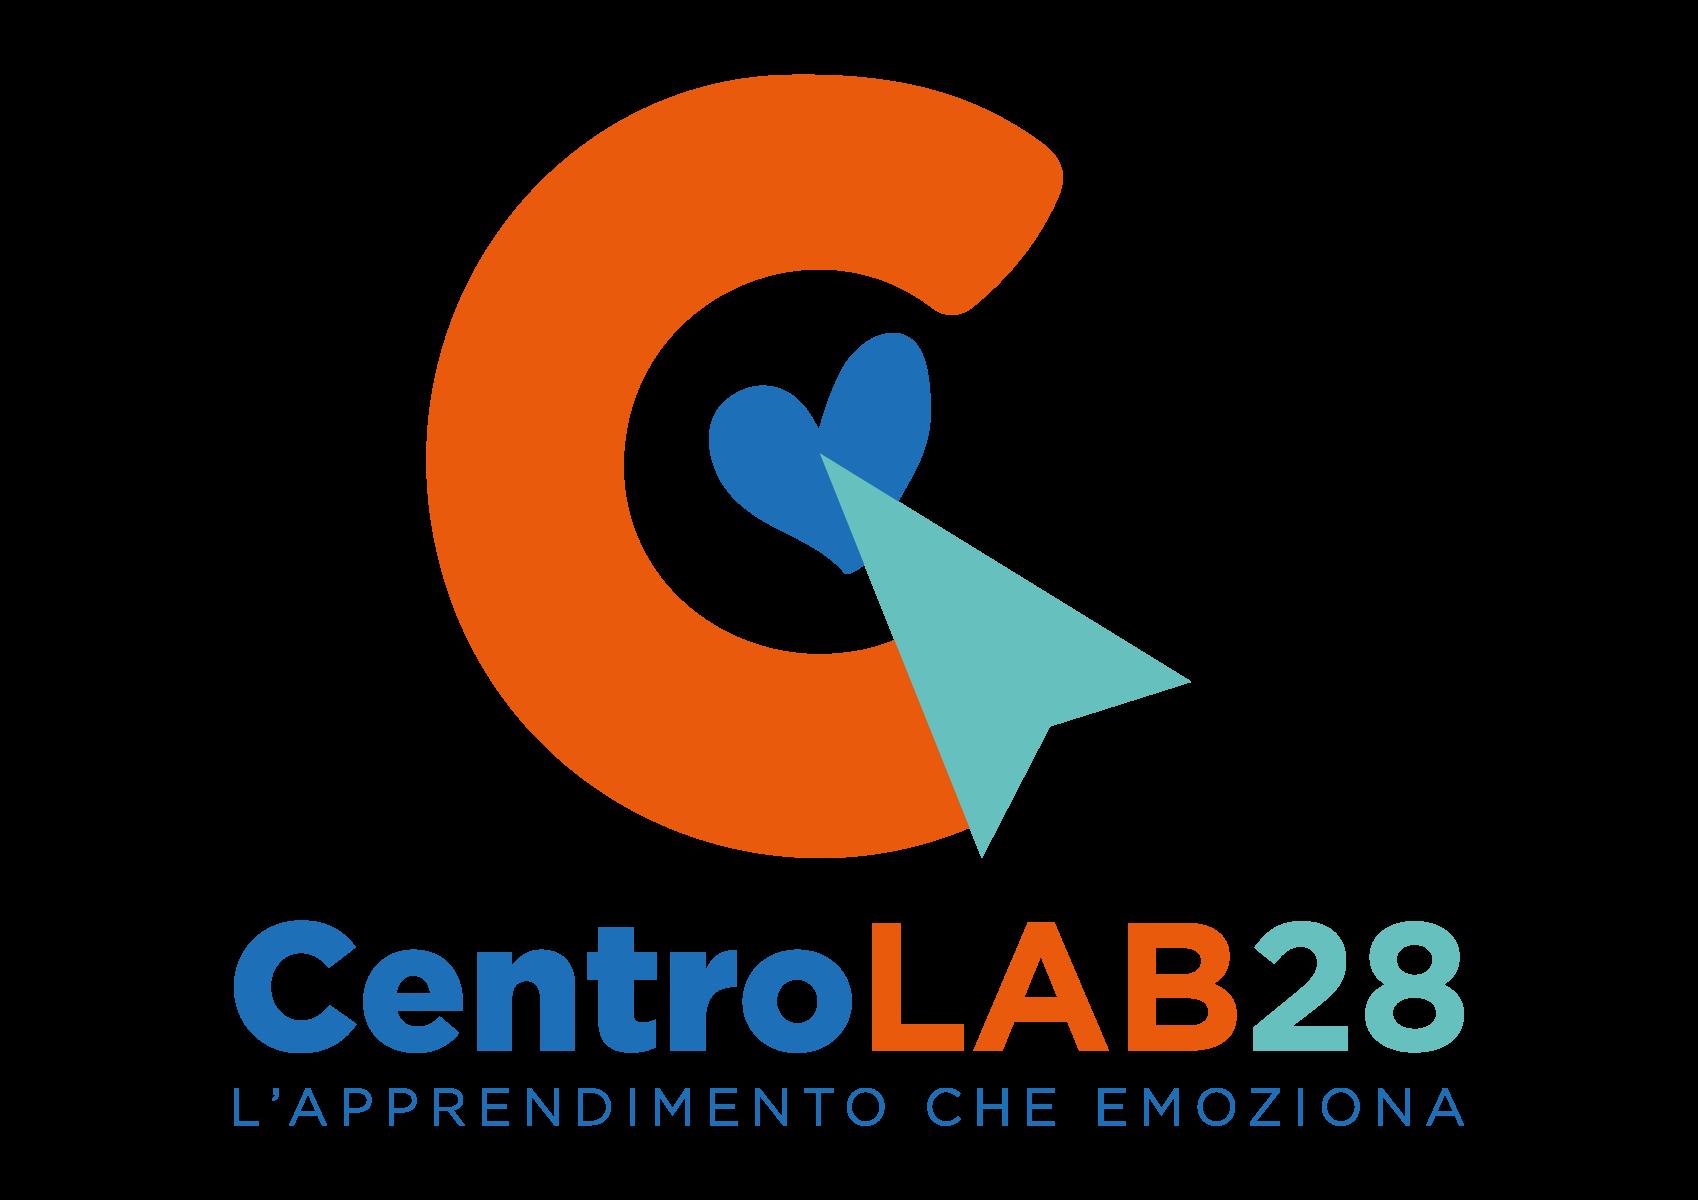 CentroLab28